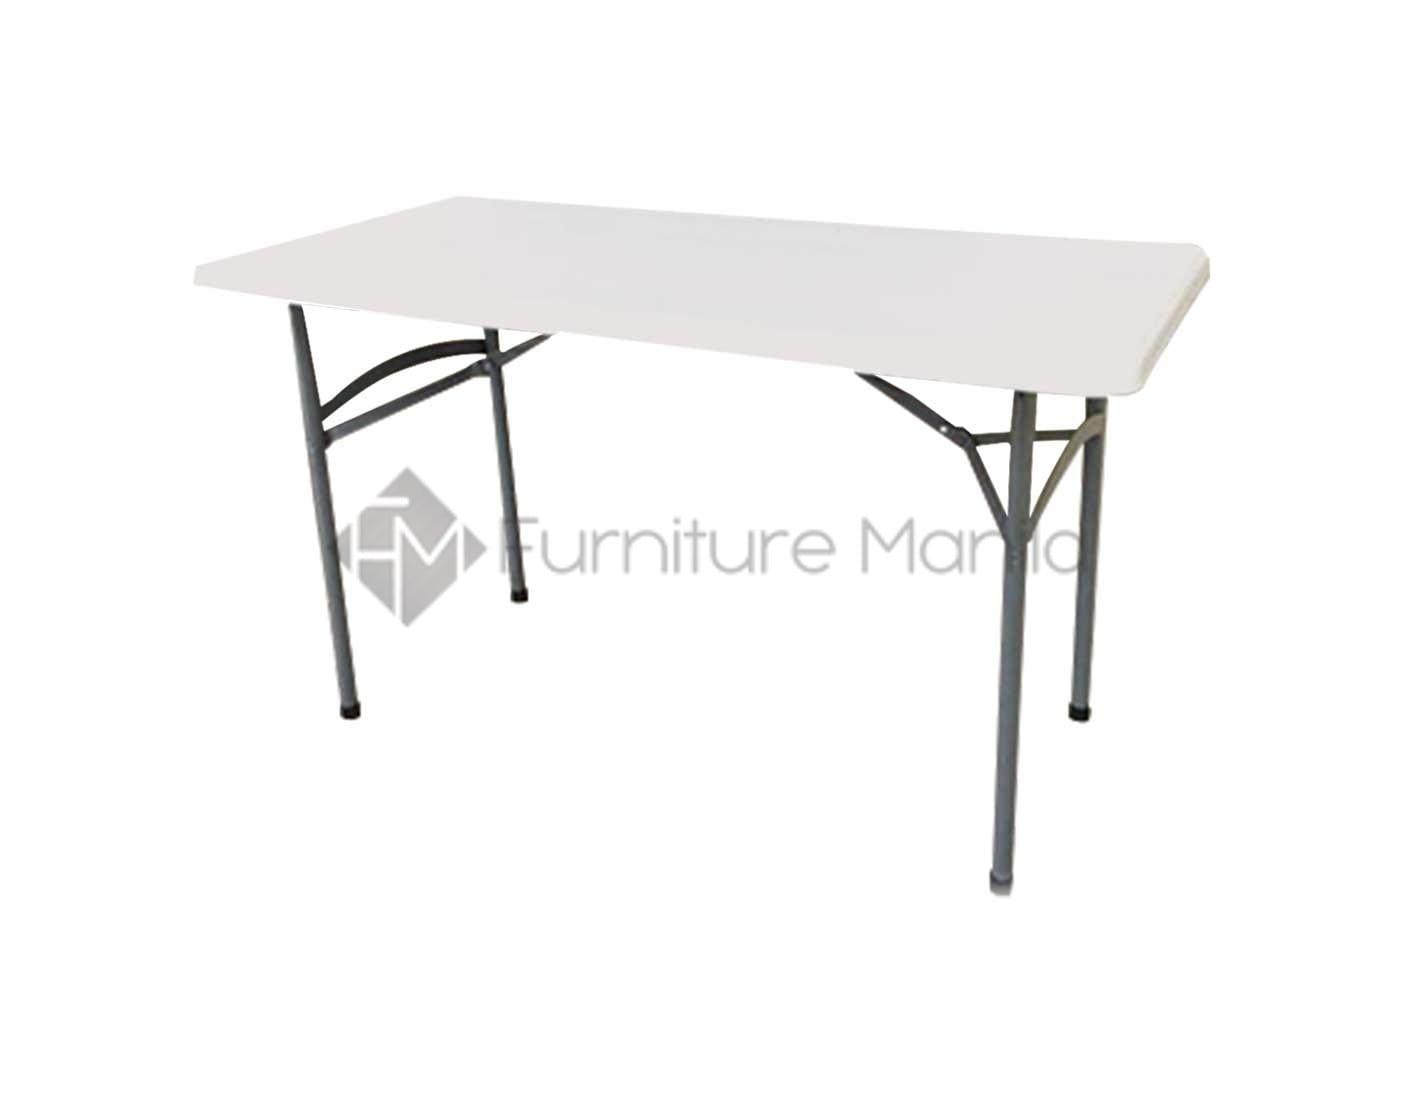 Hp4f Folding Table Furniture Manila